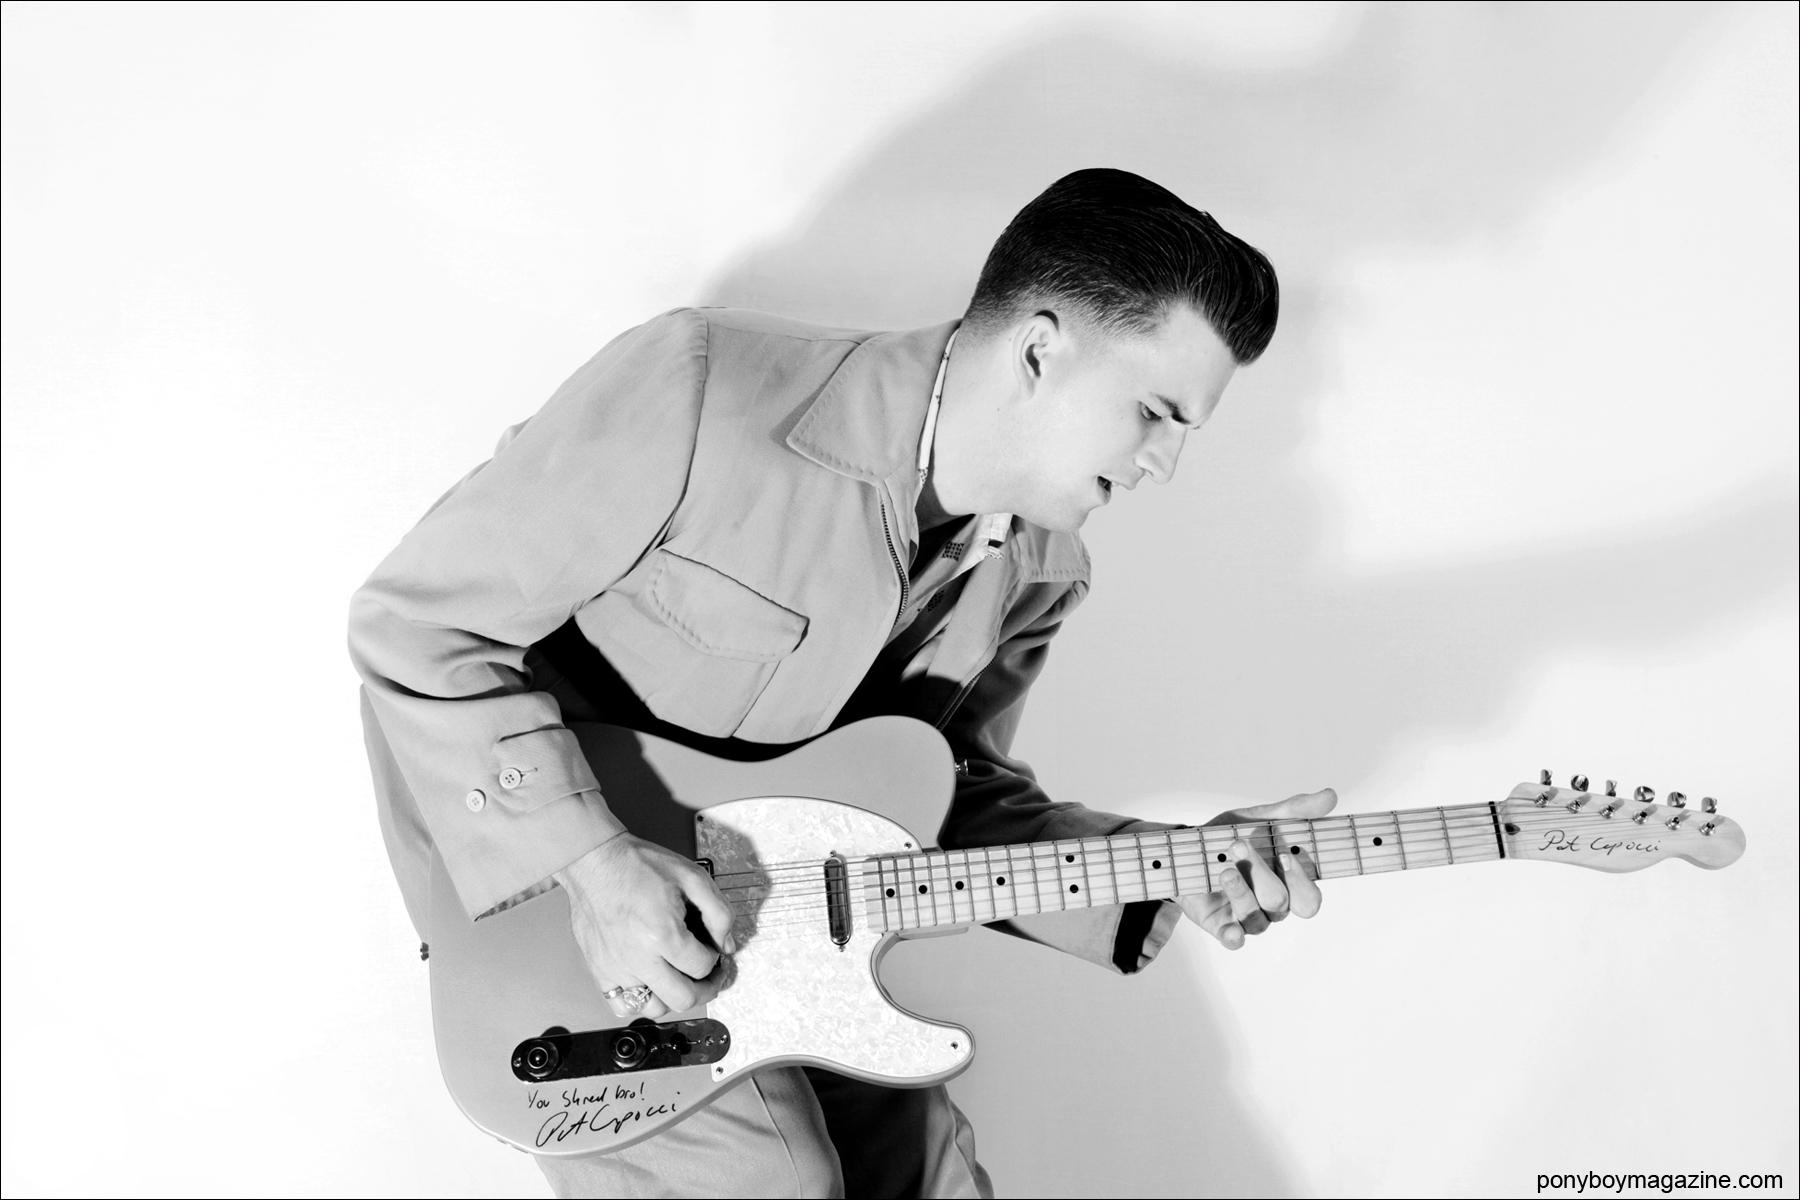 Rockabilly musician Josh Hi-Fil Sorheim photographed by Alexander Thompson for Ponyboy Magazine.